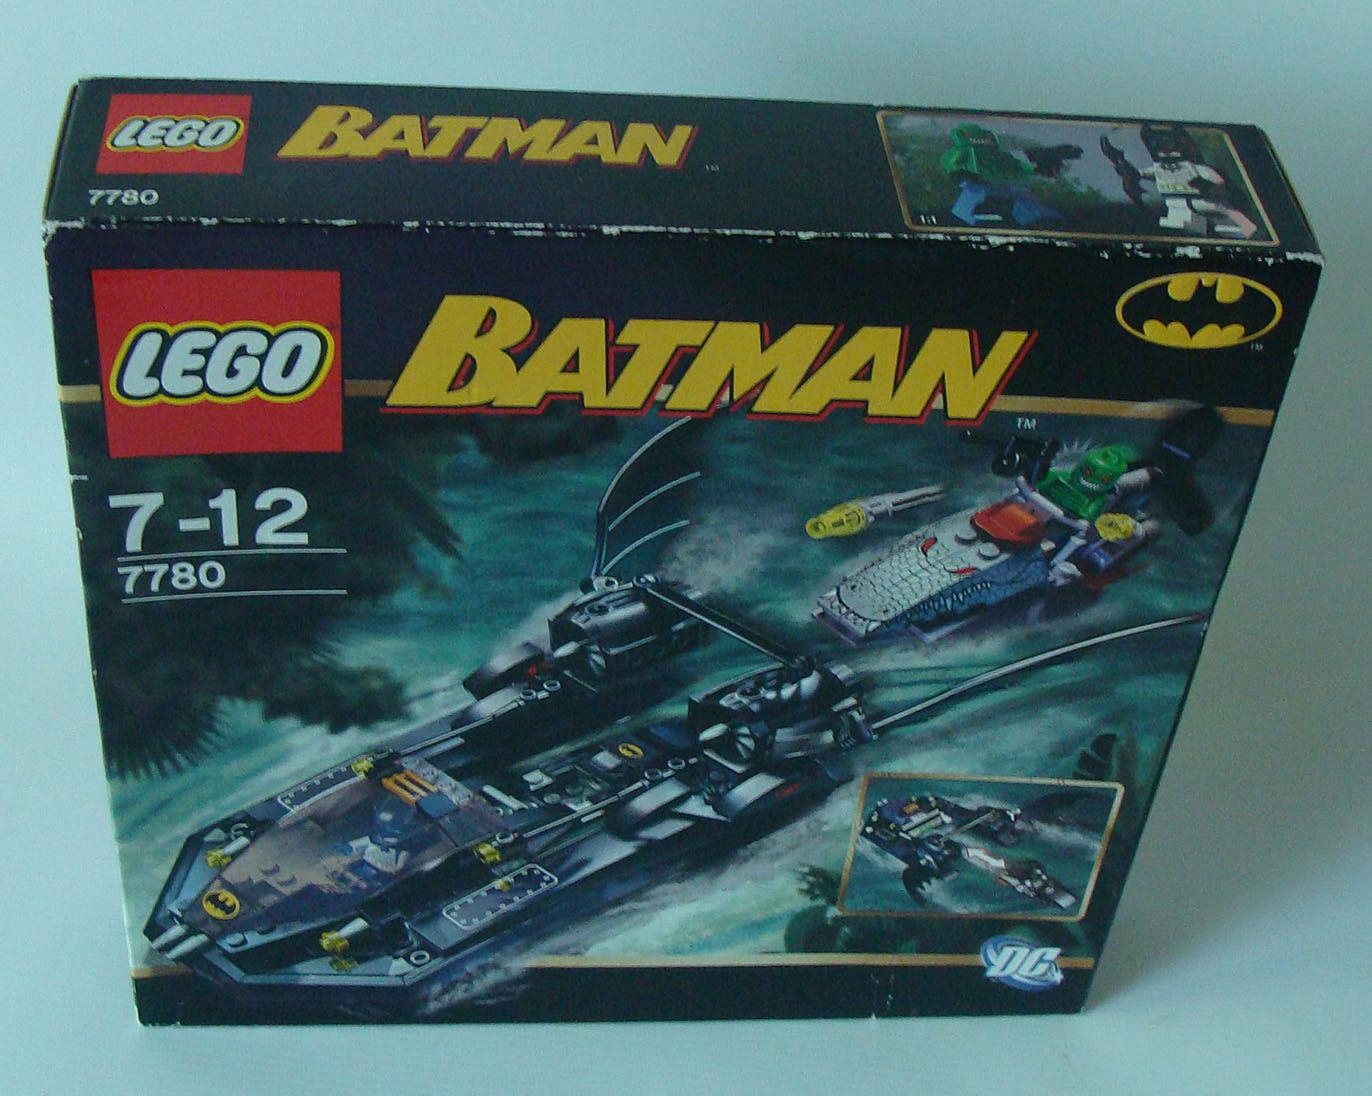 Lego® 7780 Batman Batboat - Jagd nach Killer Croco 7-12 Jahren 188 Teile - Neu  | Stabile Qualität